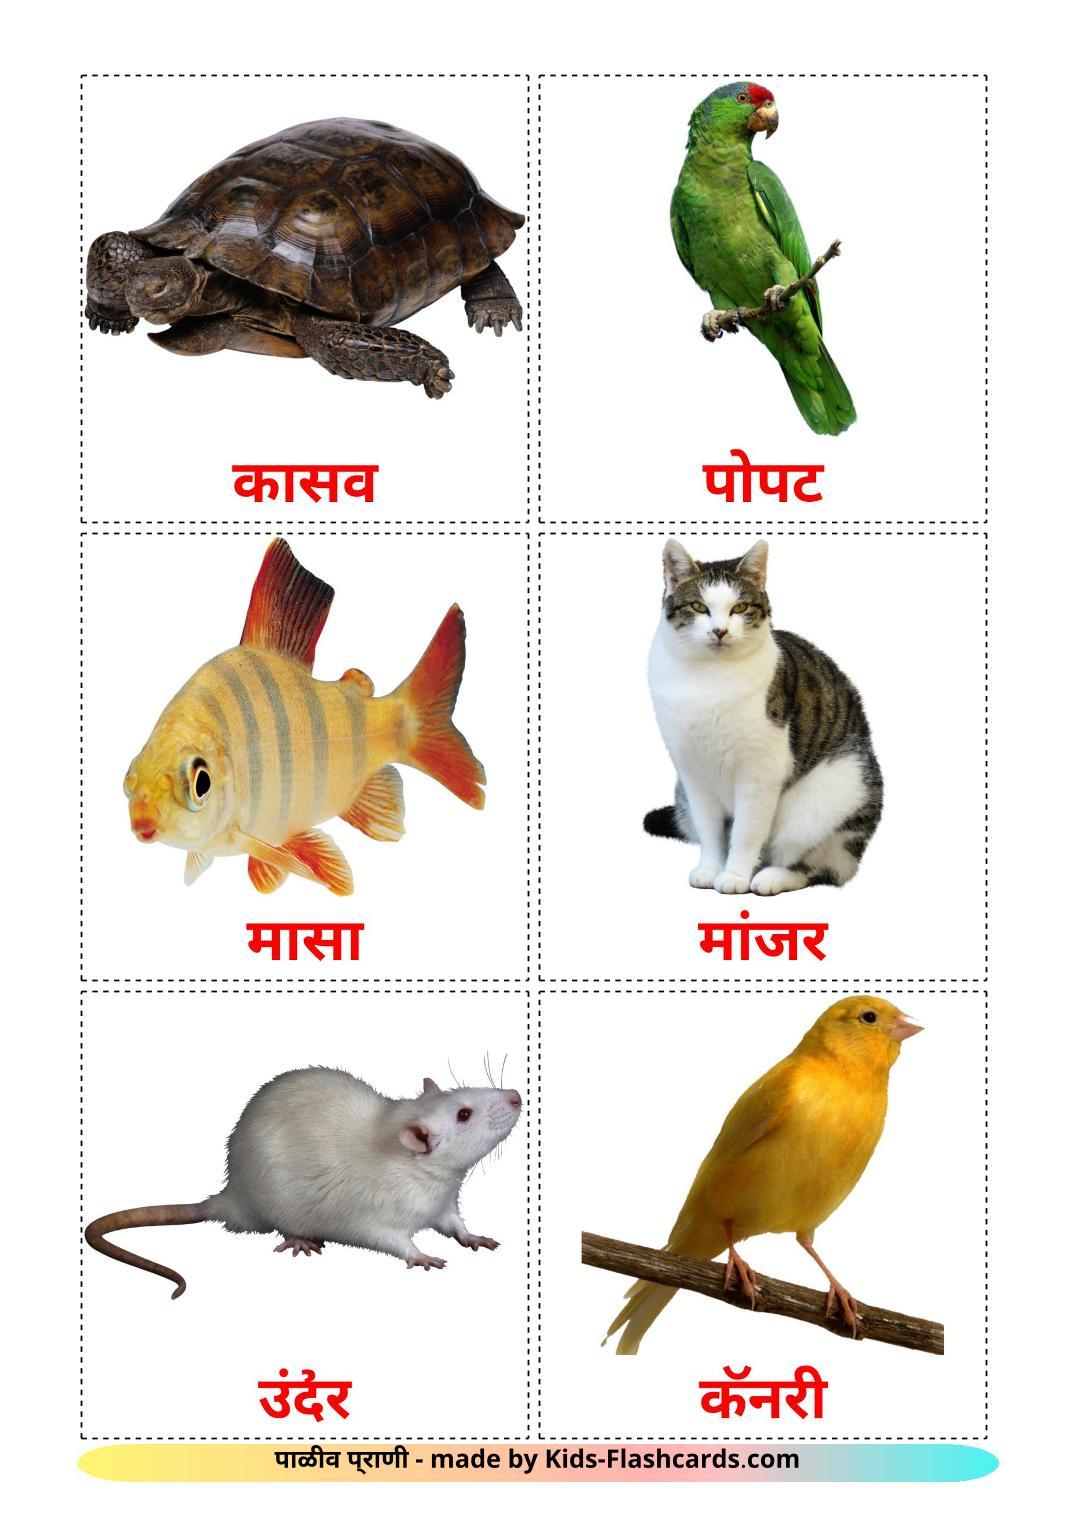 Domestic animals - 10 Free Printable marathi Flashcards